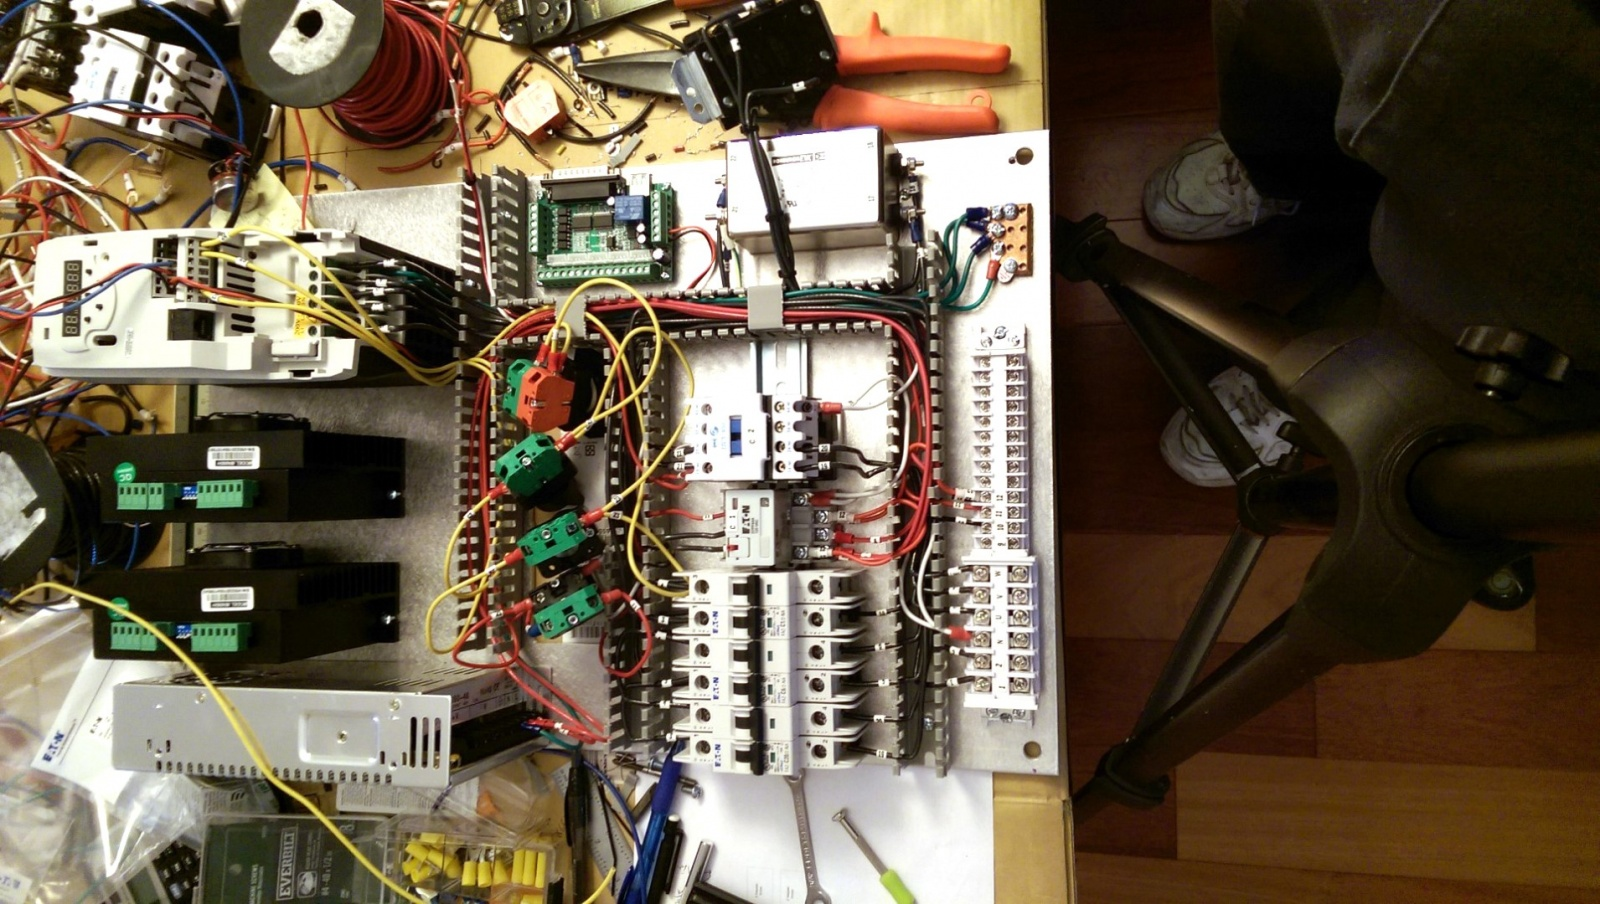 Модернизация токарного станка под работу с ЧПУ - 9